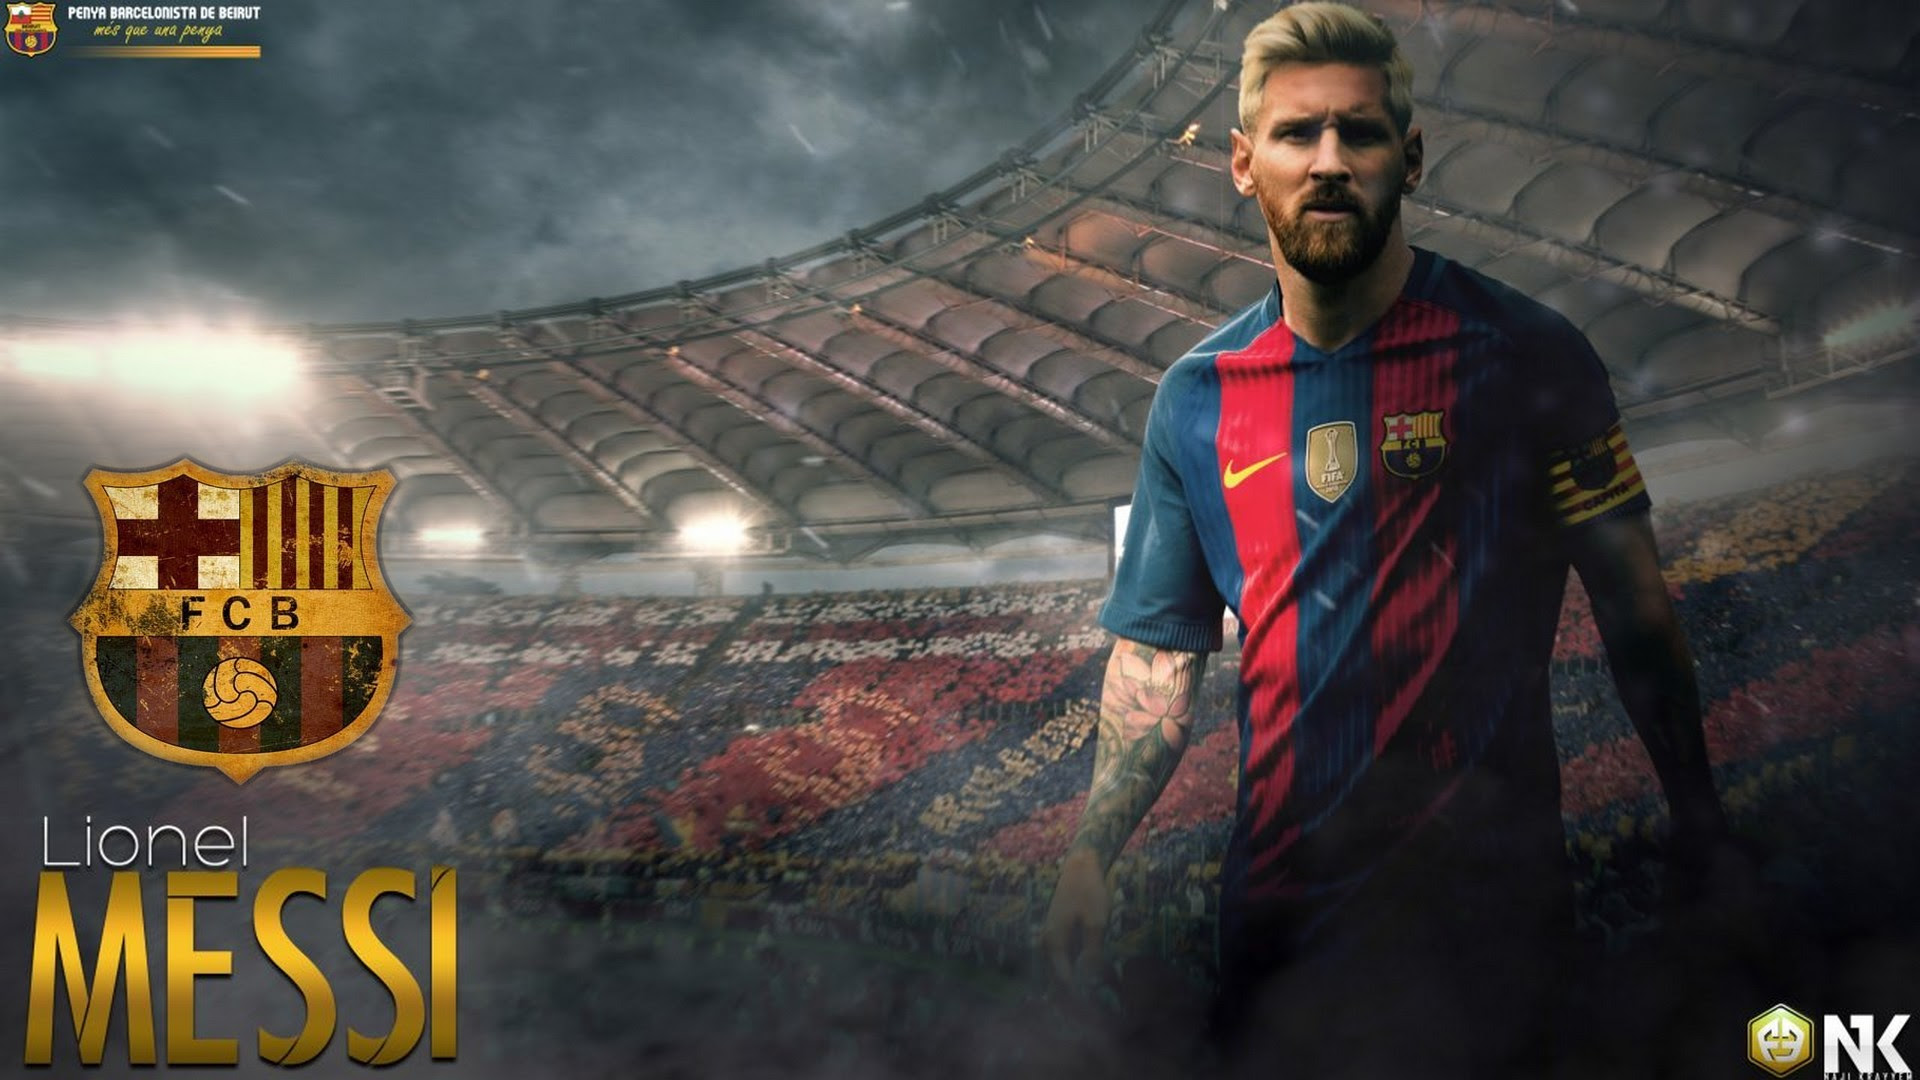 Wallpapers HD Lionel Messi Barcelona | 2019 Football Wallpaper